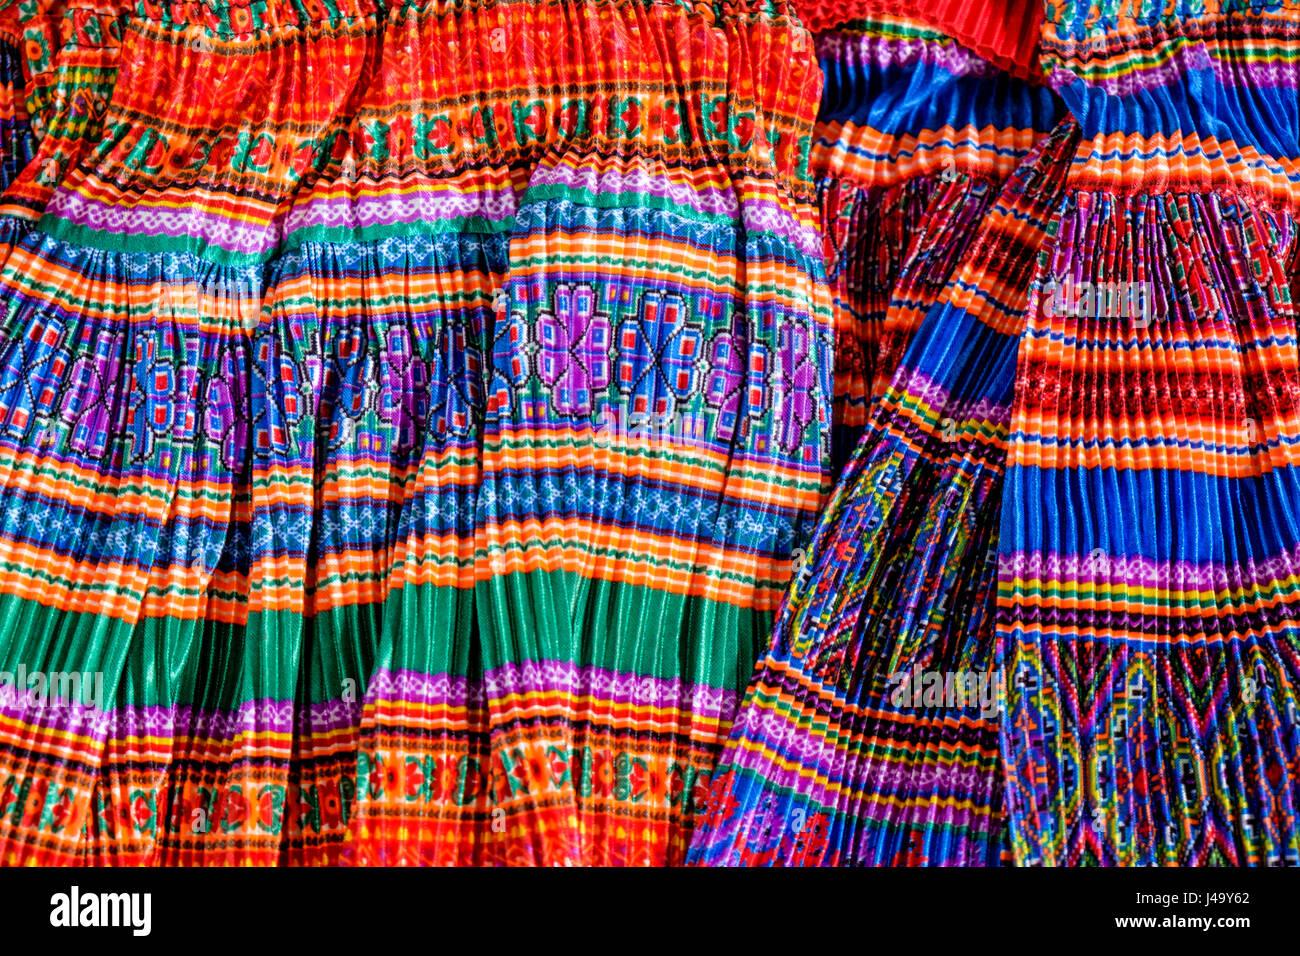 SAPA, VIETNAM - CIRCA SEPTEMBER 2014:  Typical dresses in the Sapa street market in North Vietnam - Stock Image